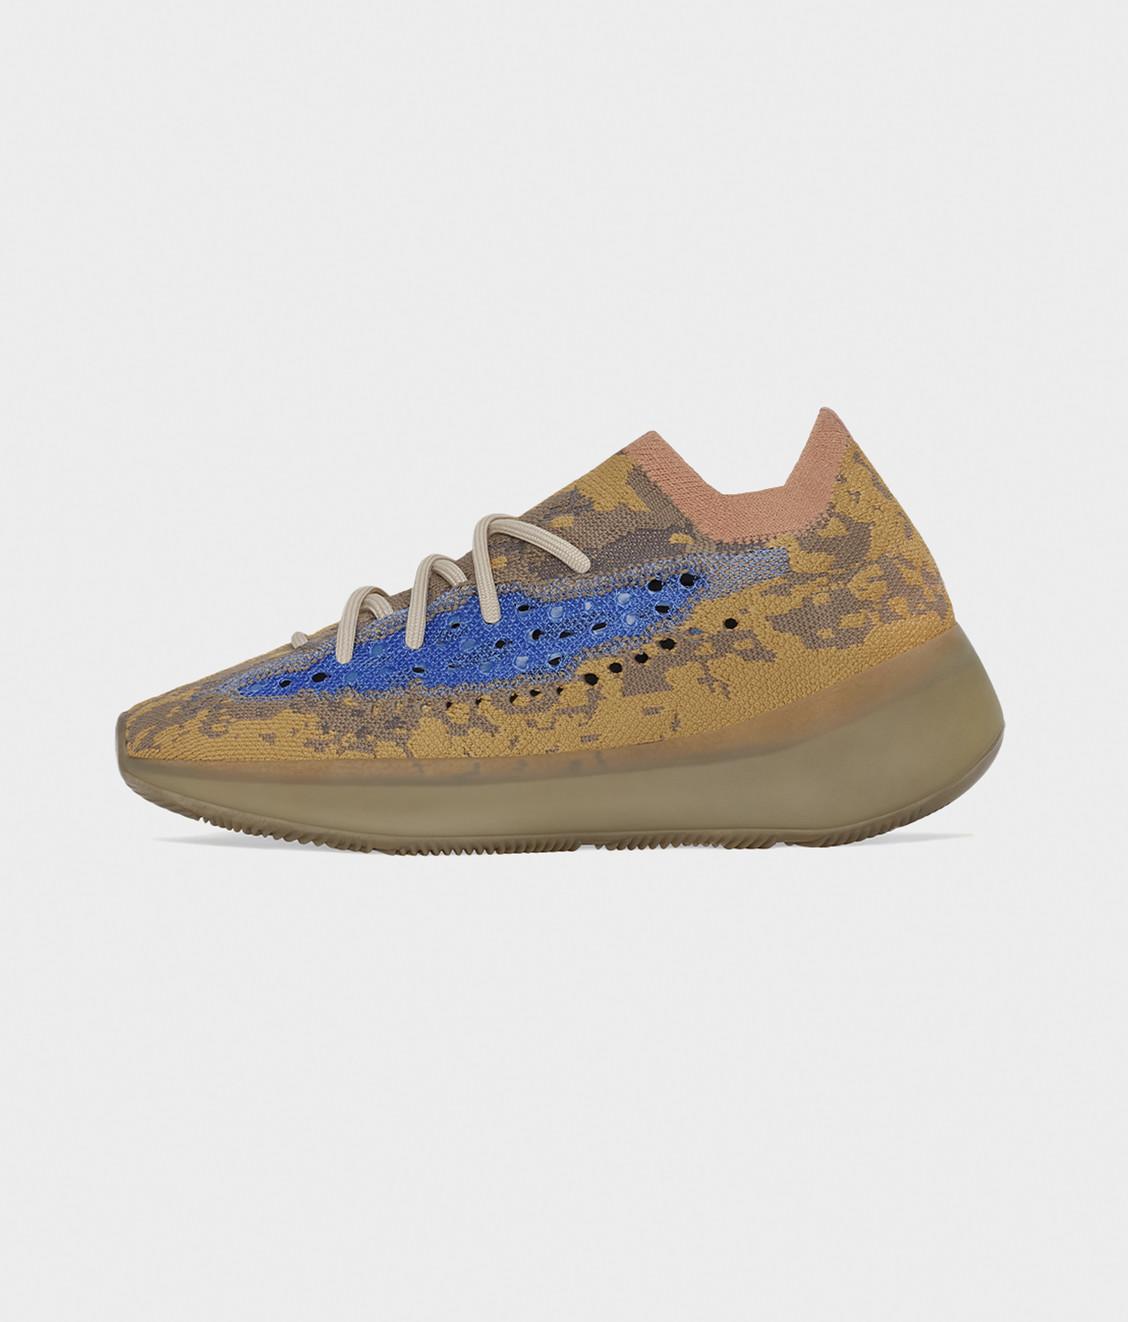 Adidas Yeezy Boost 380 Blue Oat